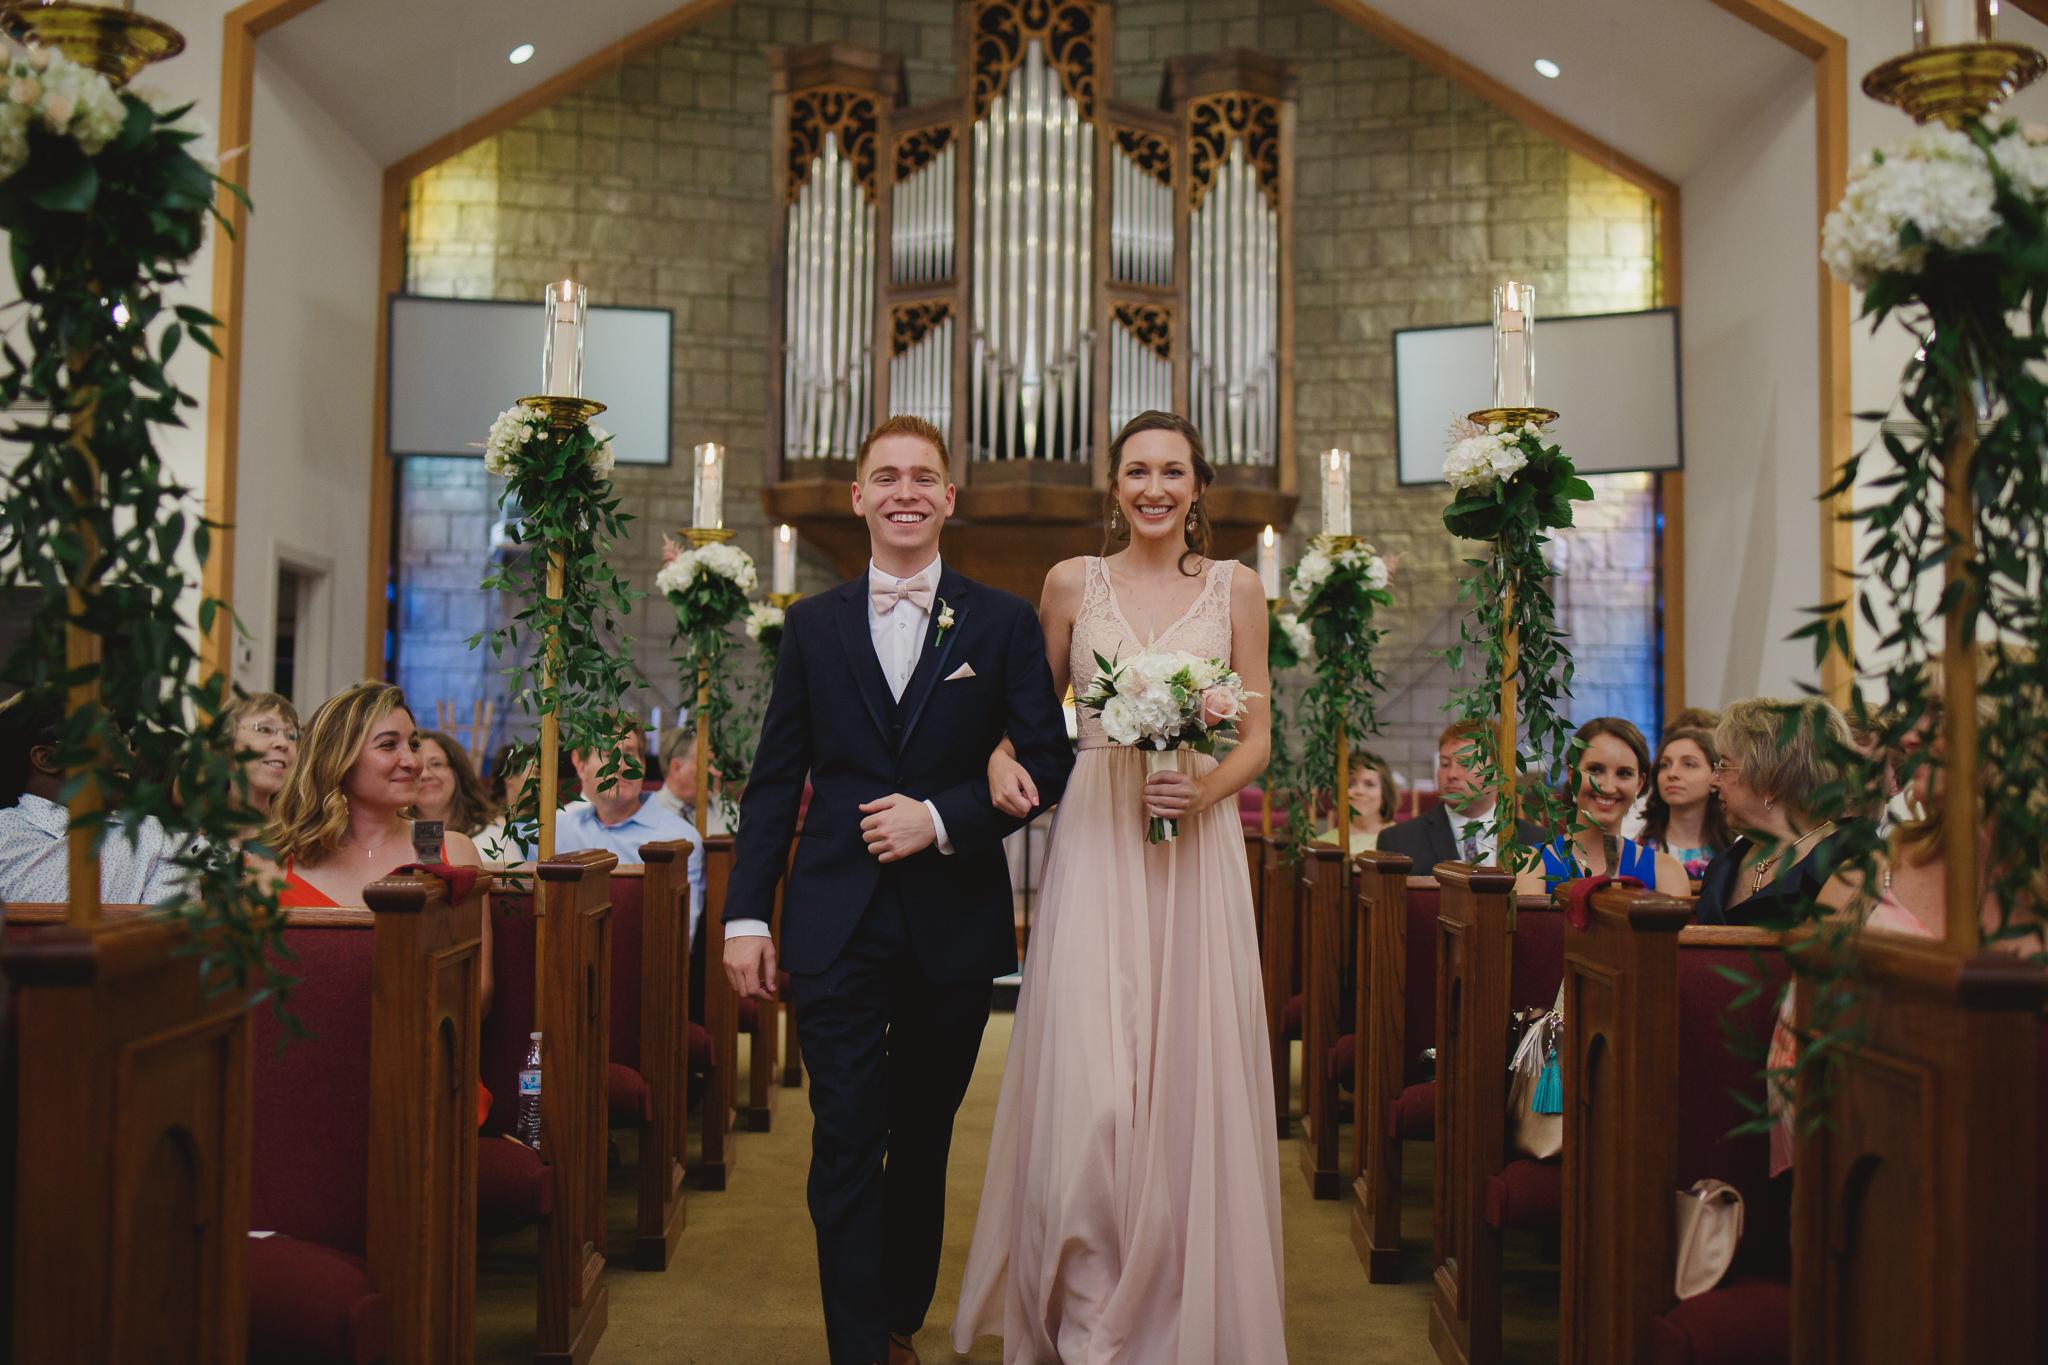 Michael and Kelly - the ashton depot - wedding DFW - wedding photographer- elizalde photography (18 of 150).jpg